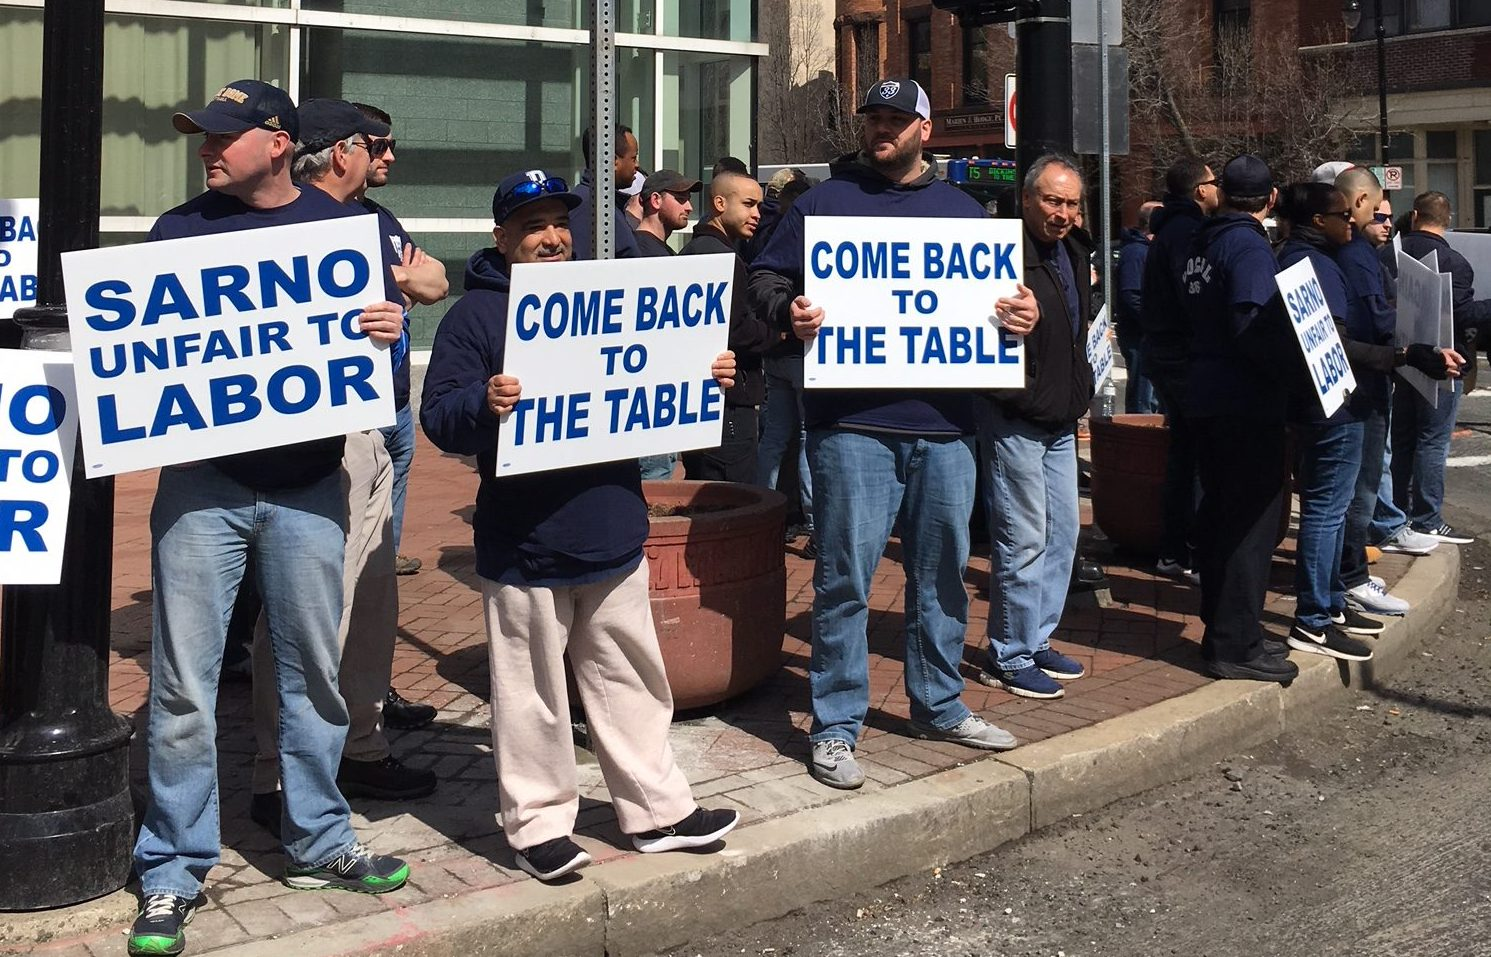 Springfield police union pickets Sarno following contract negotiation breakdowns